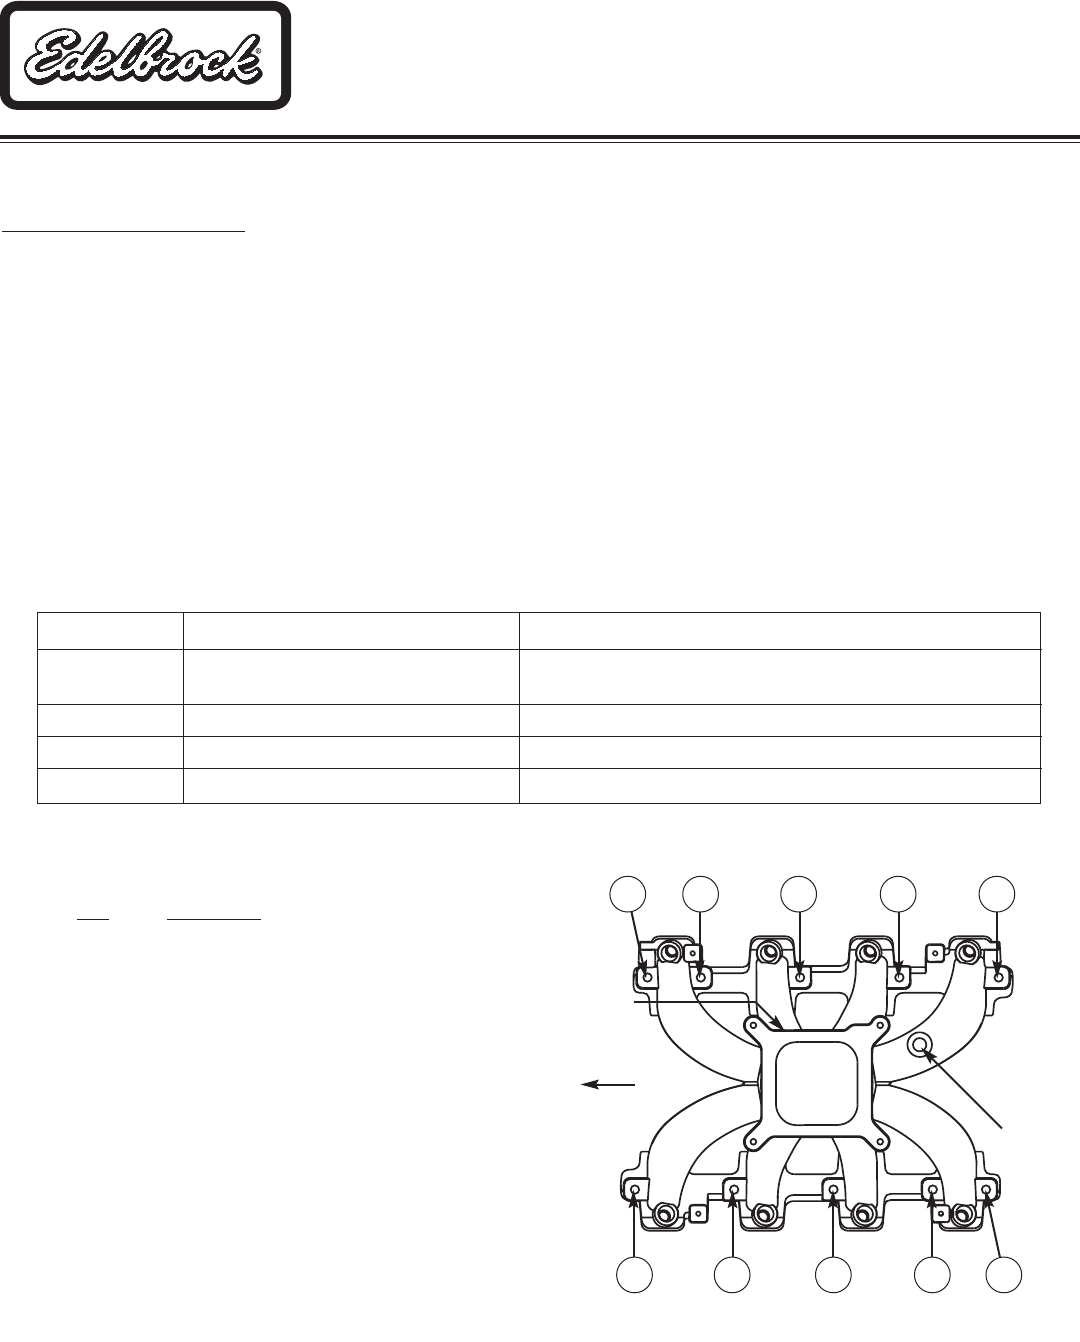 hight resolution of edelbrock ls1 controller wiring diagram